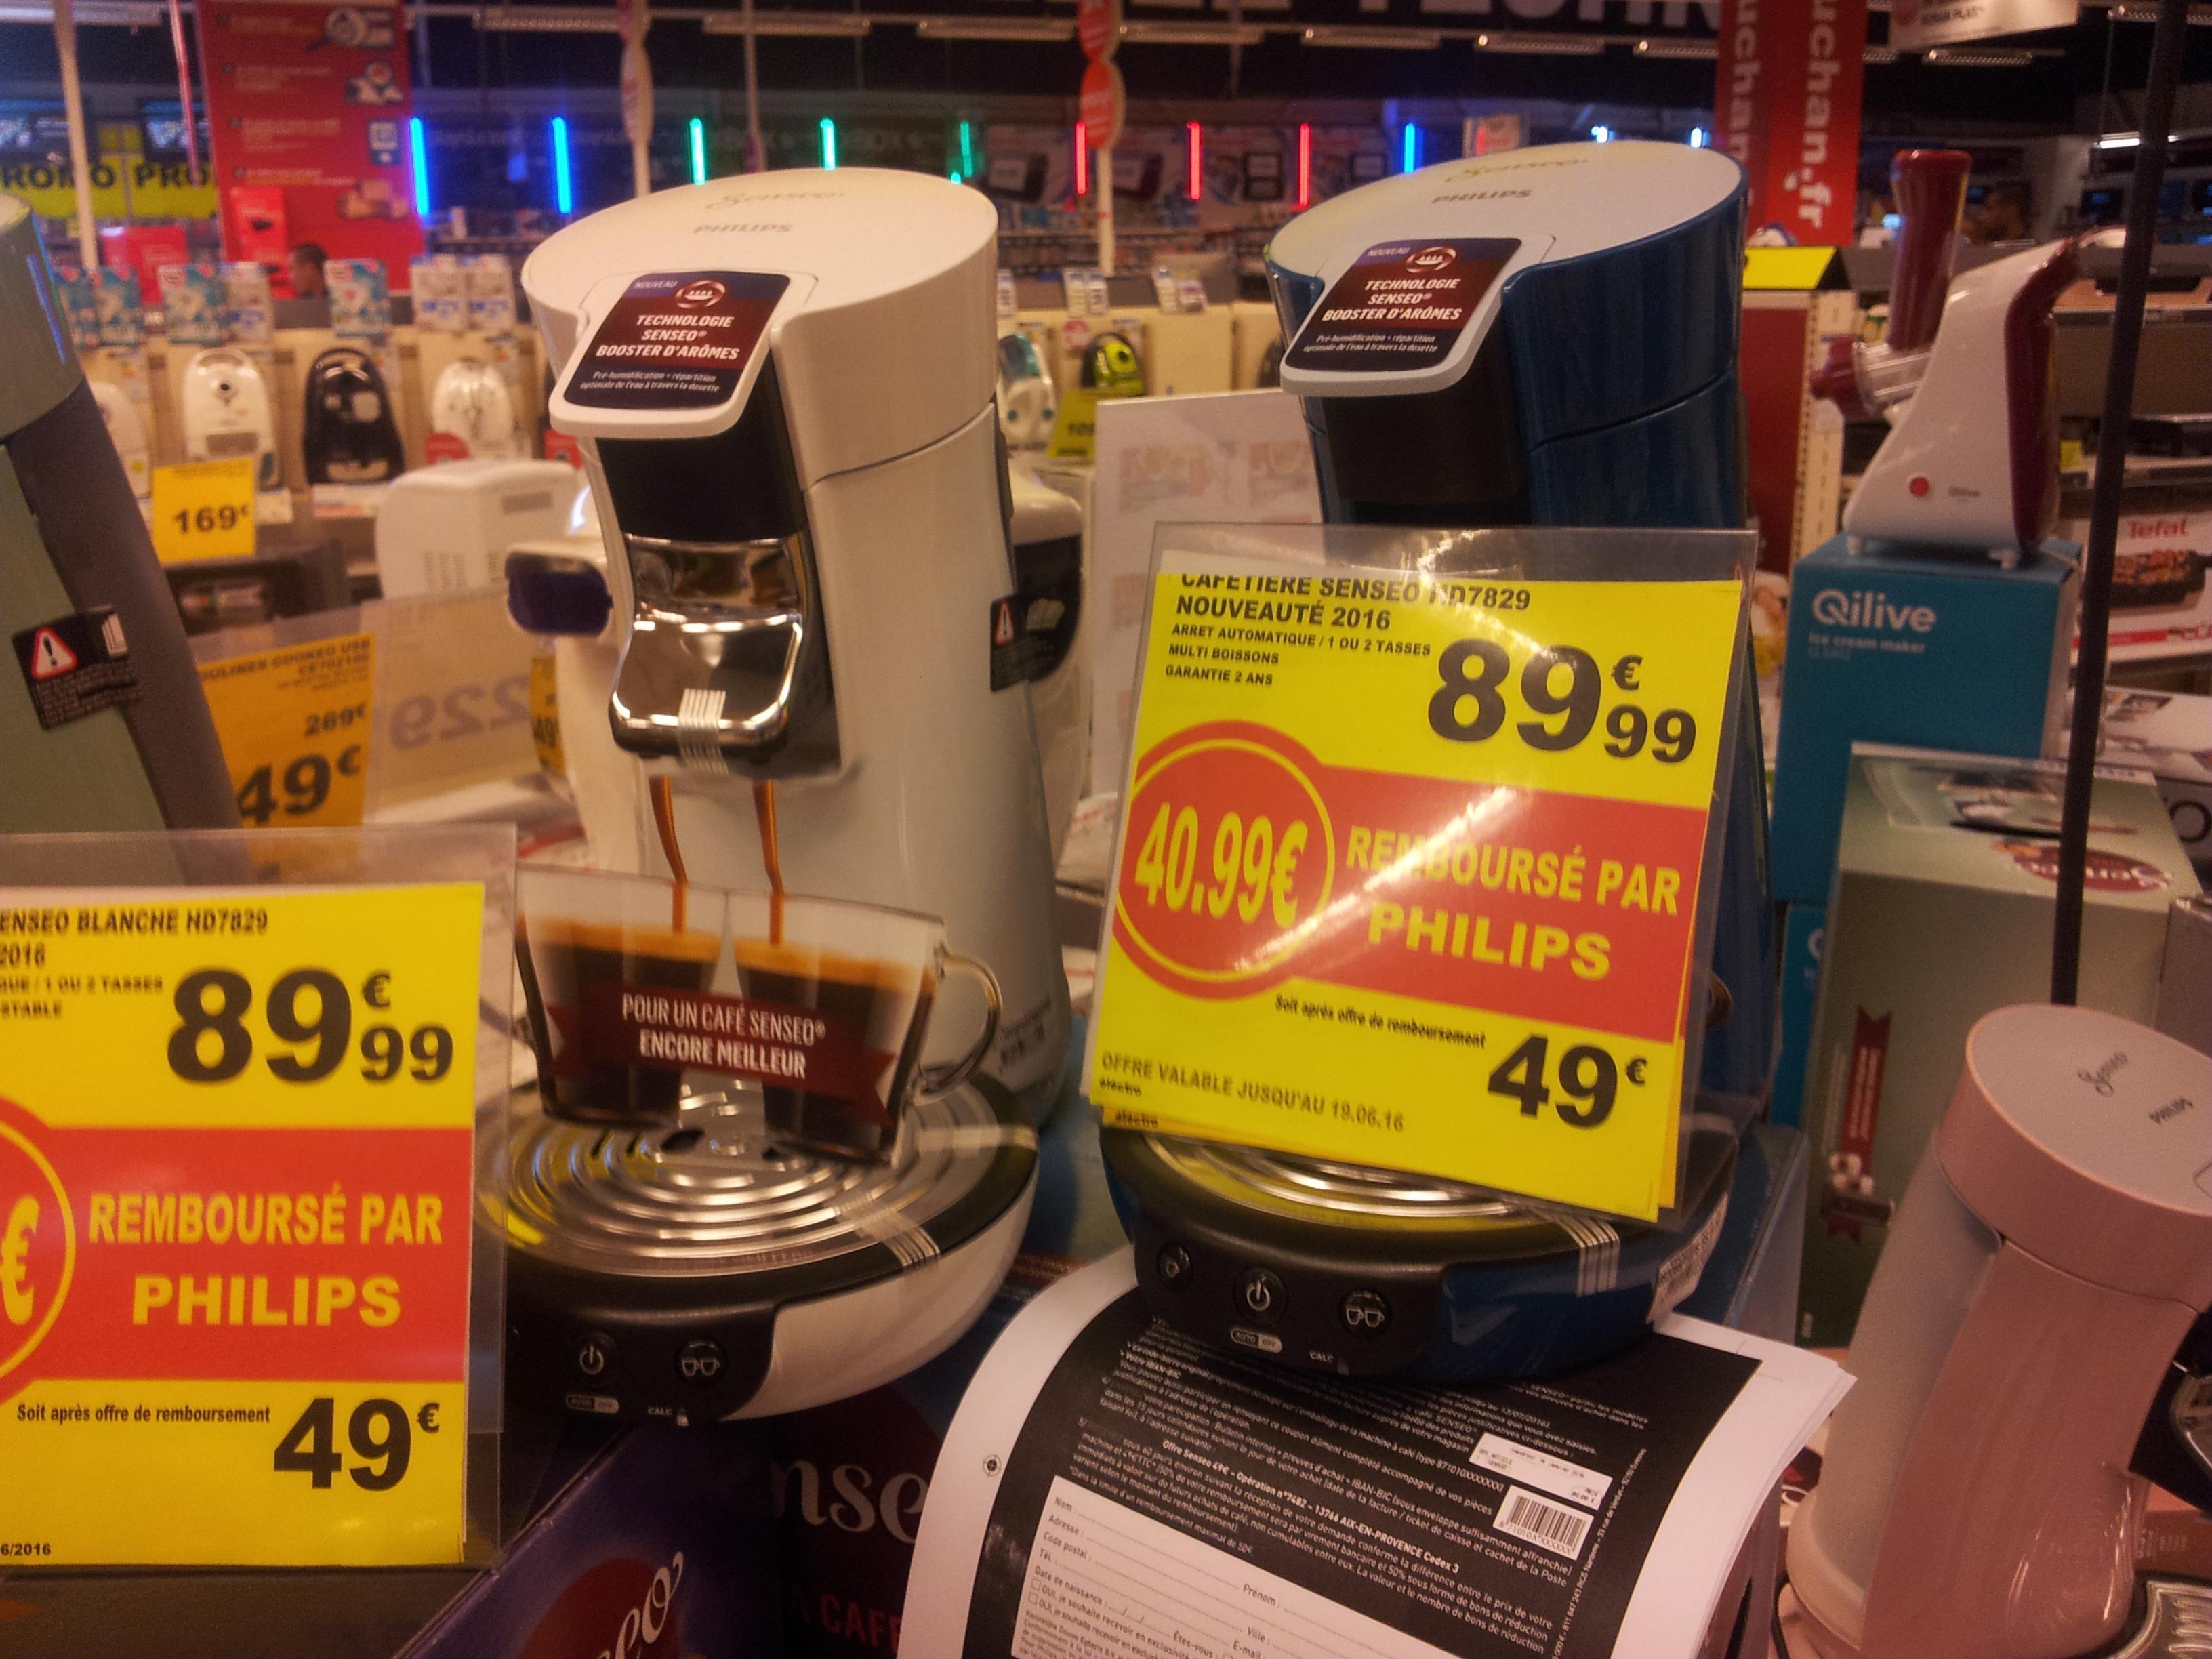 Cafetière Senseo HD7829 (Via ODR de 40.99€)